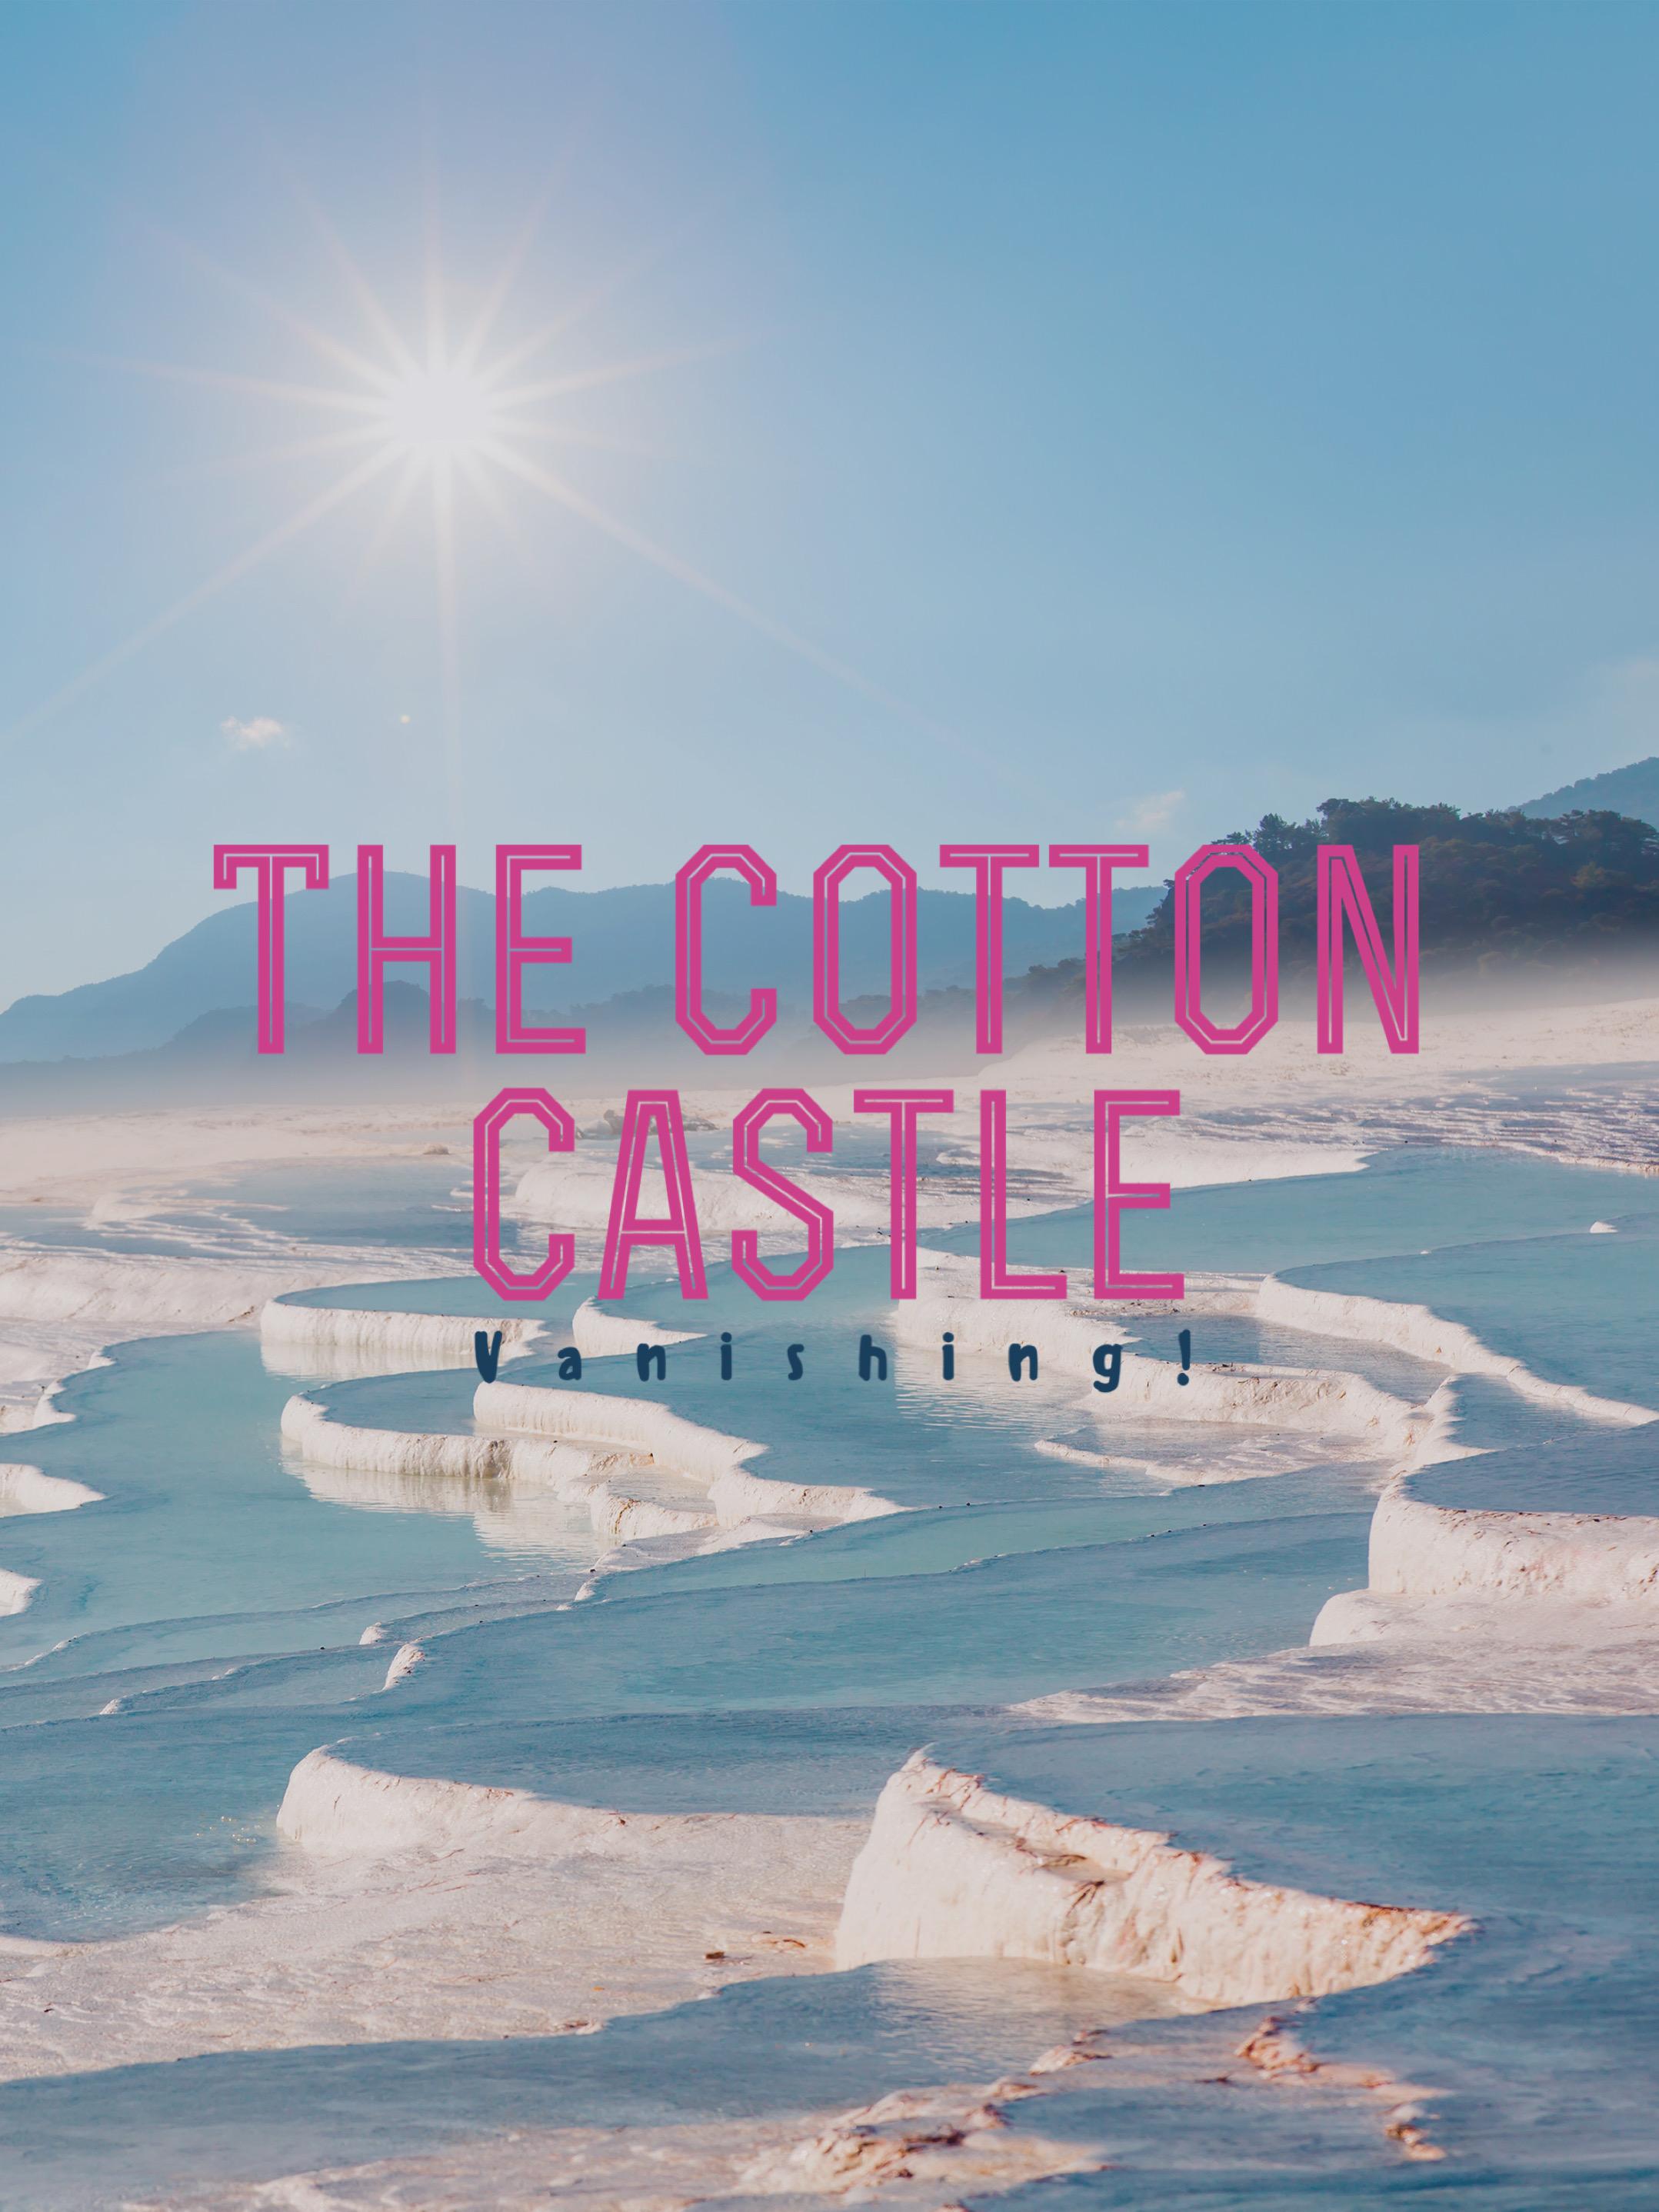 Vanishing! The Cotton Castle